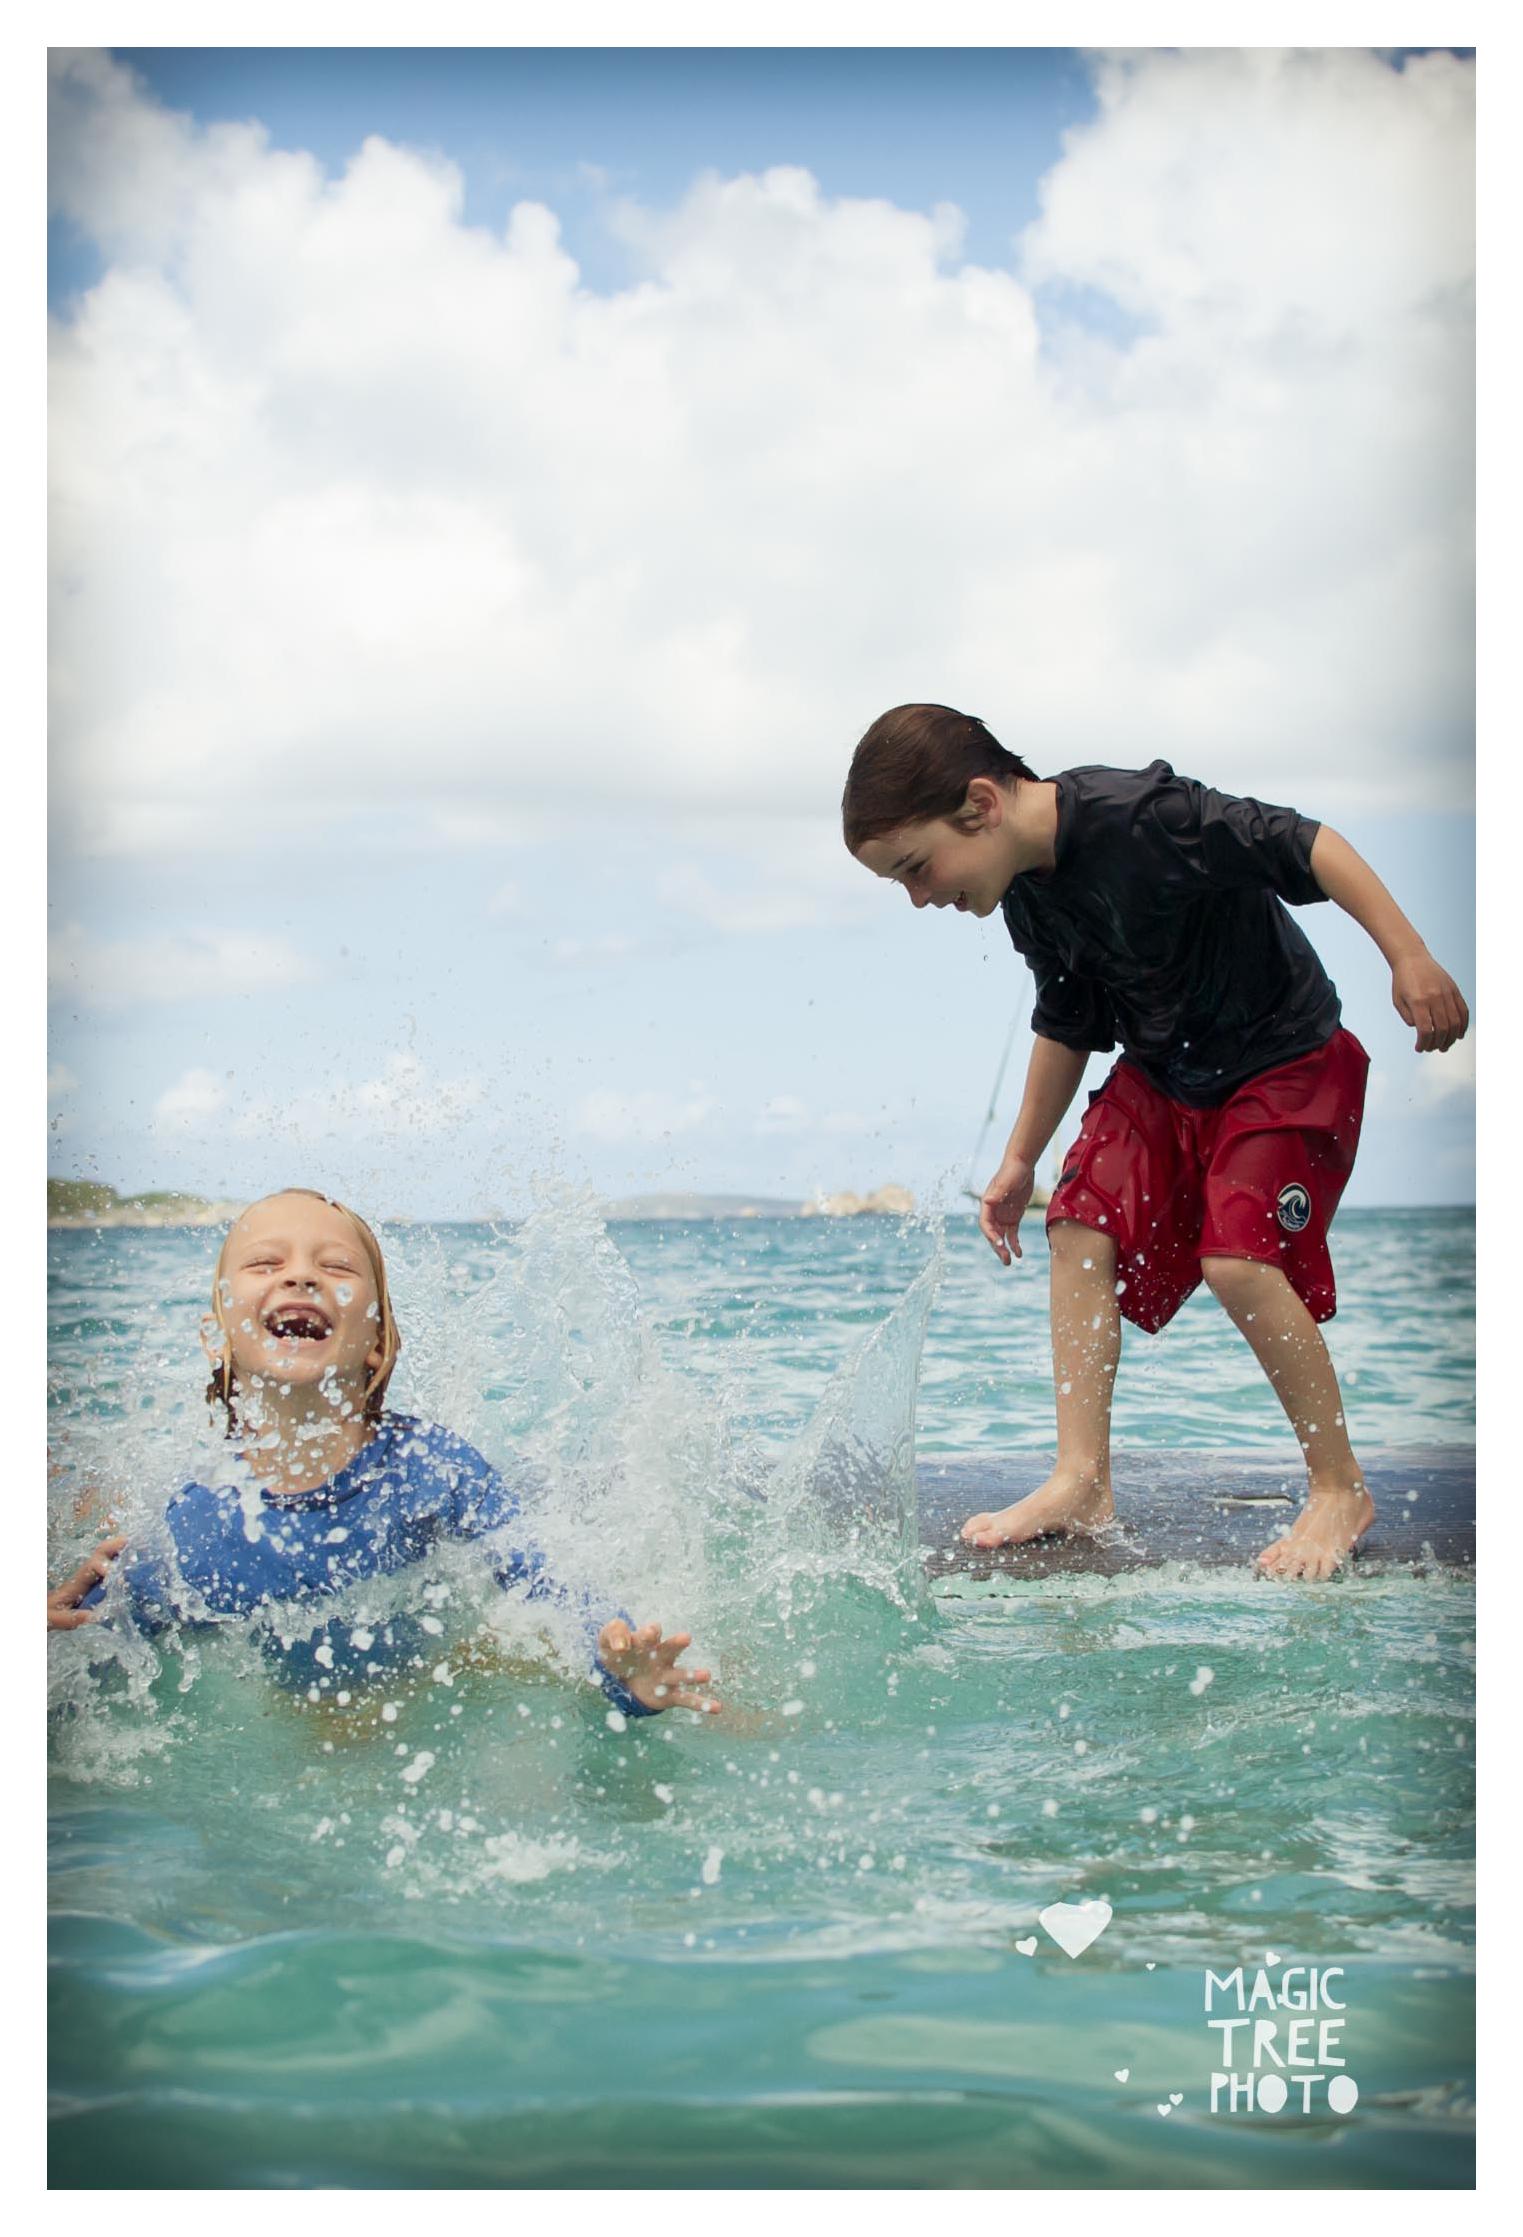 dax splashing for web.jpg